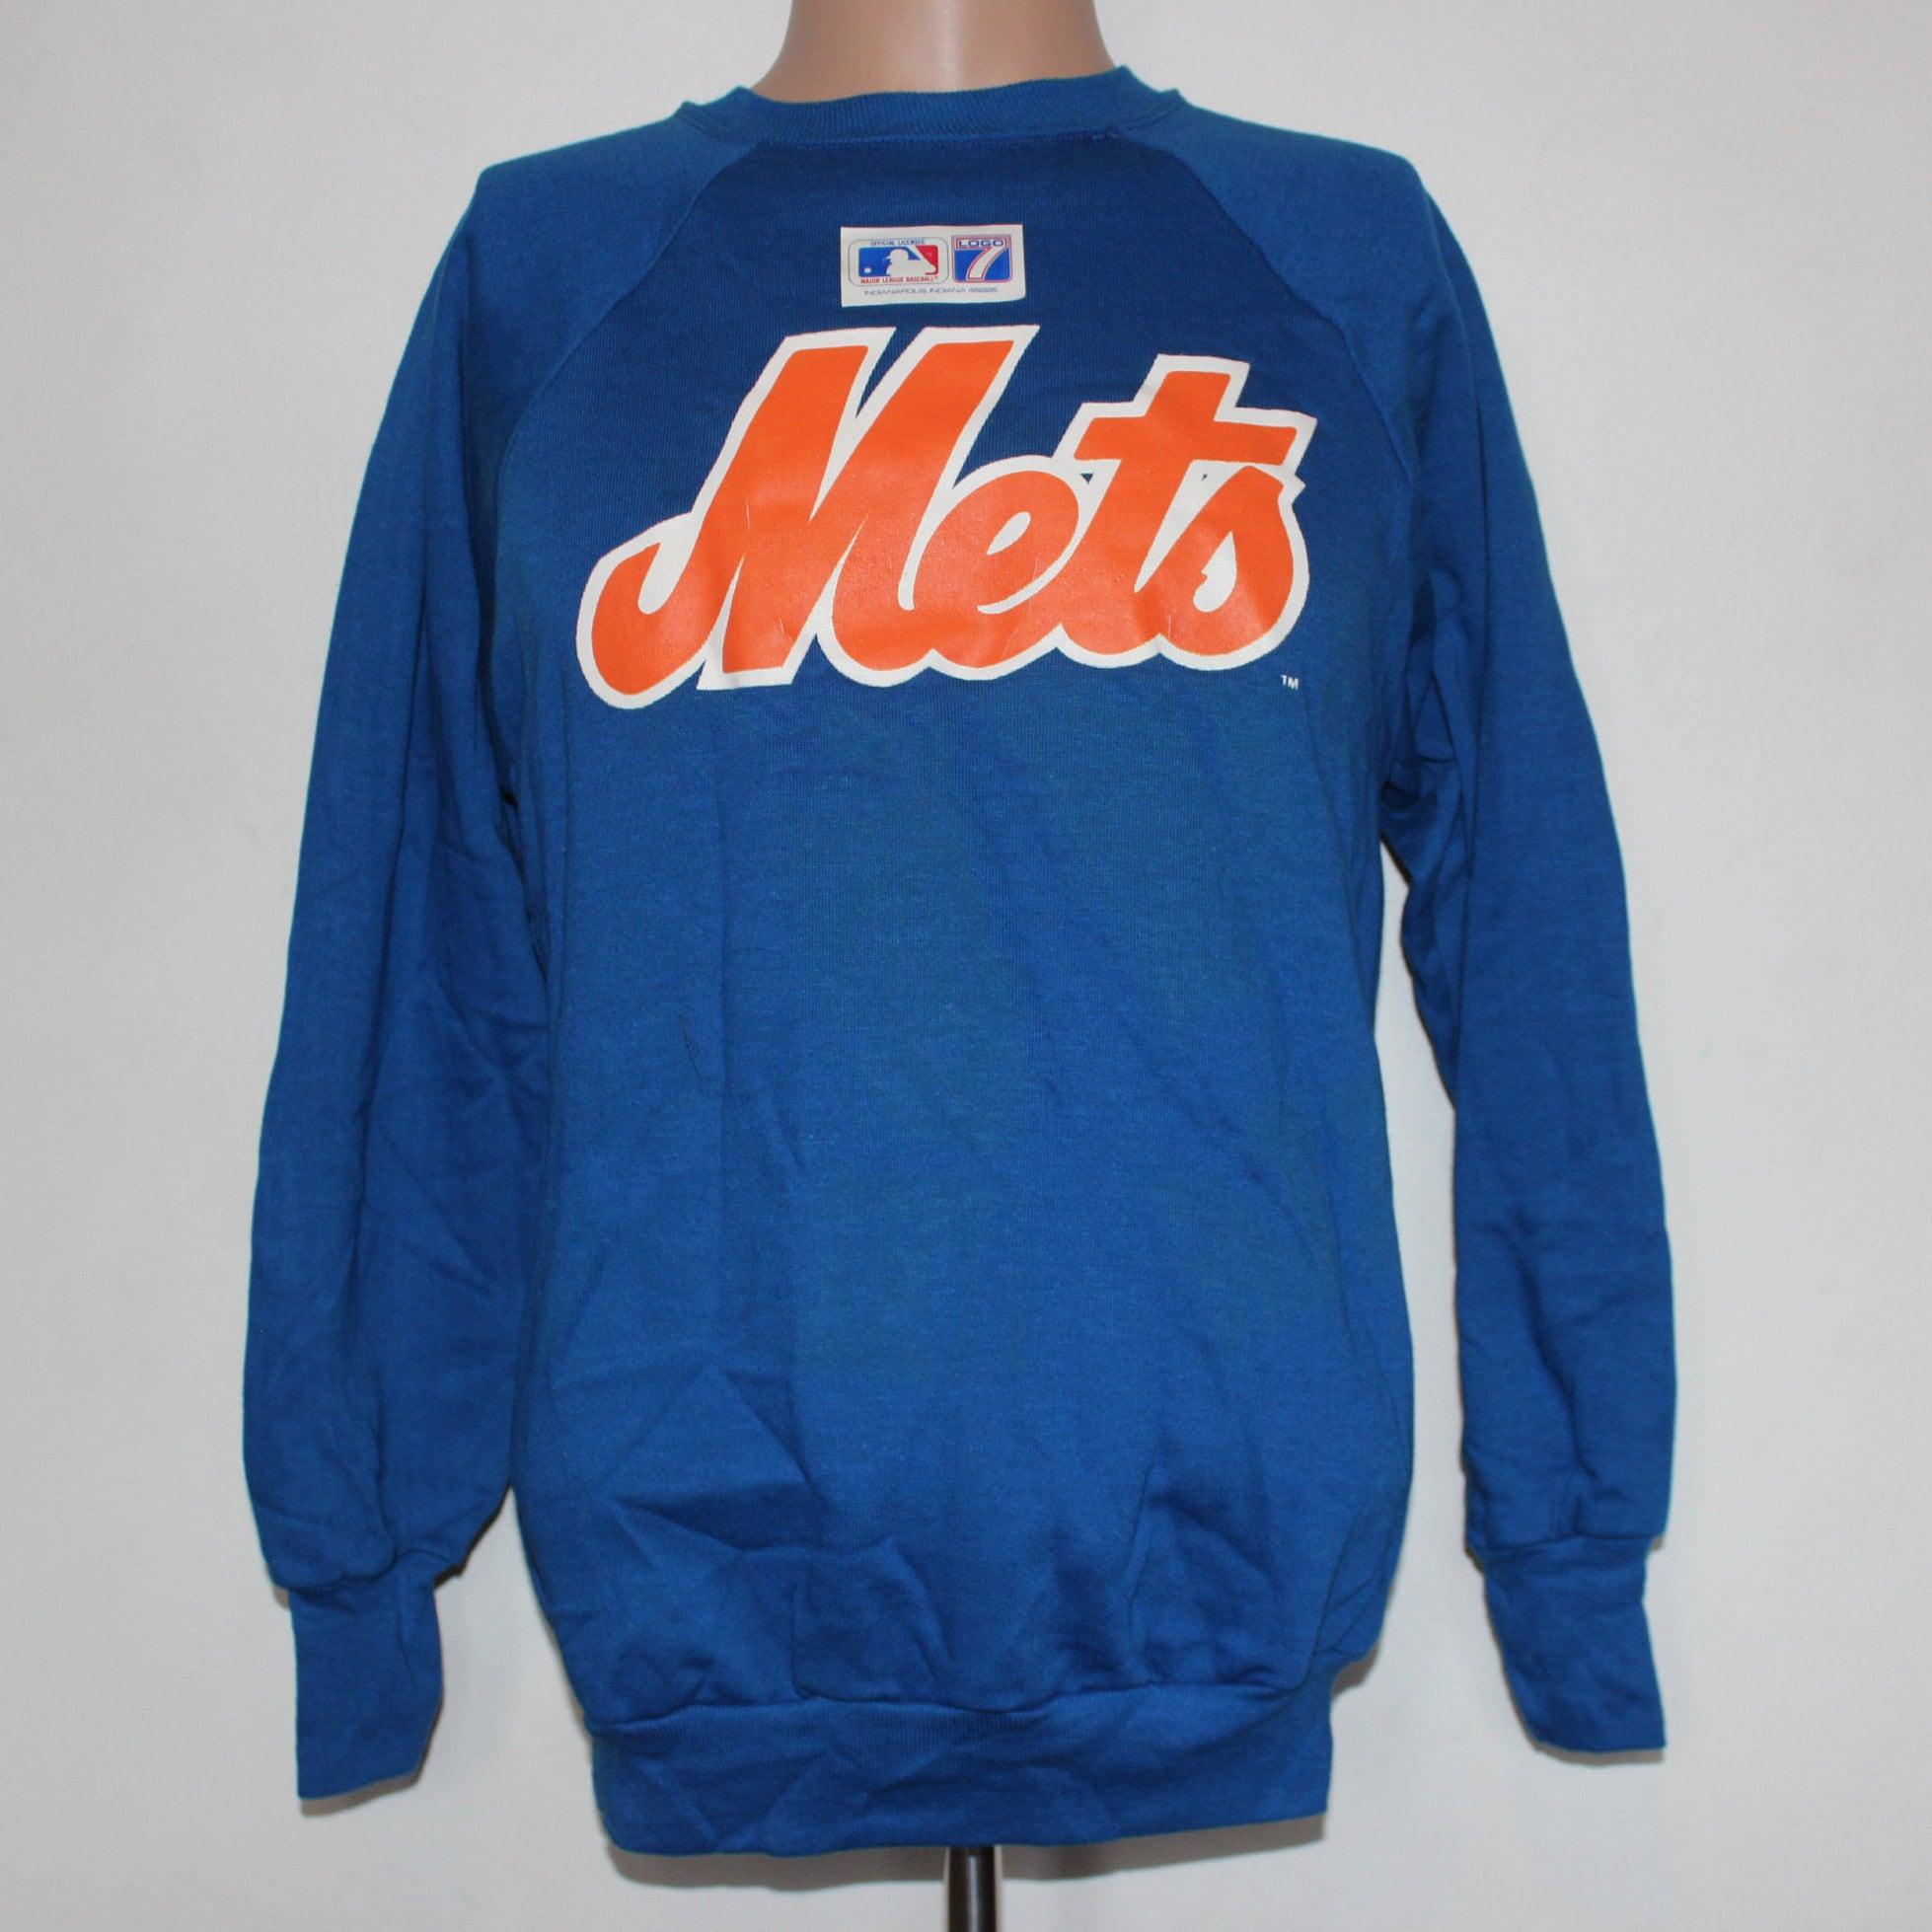 brand new cbf1c 2ed60 Vintage Deadstock New York Mets MLB Crewneck Sweatshirt M